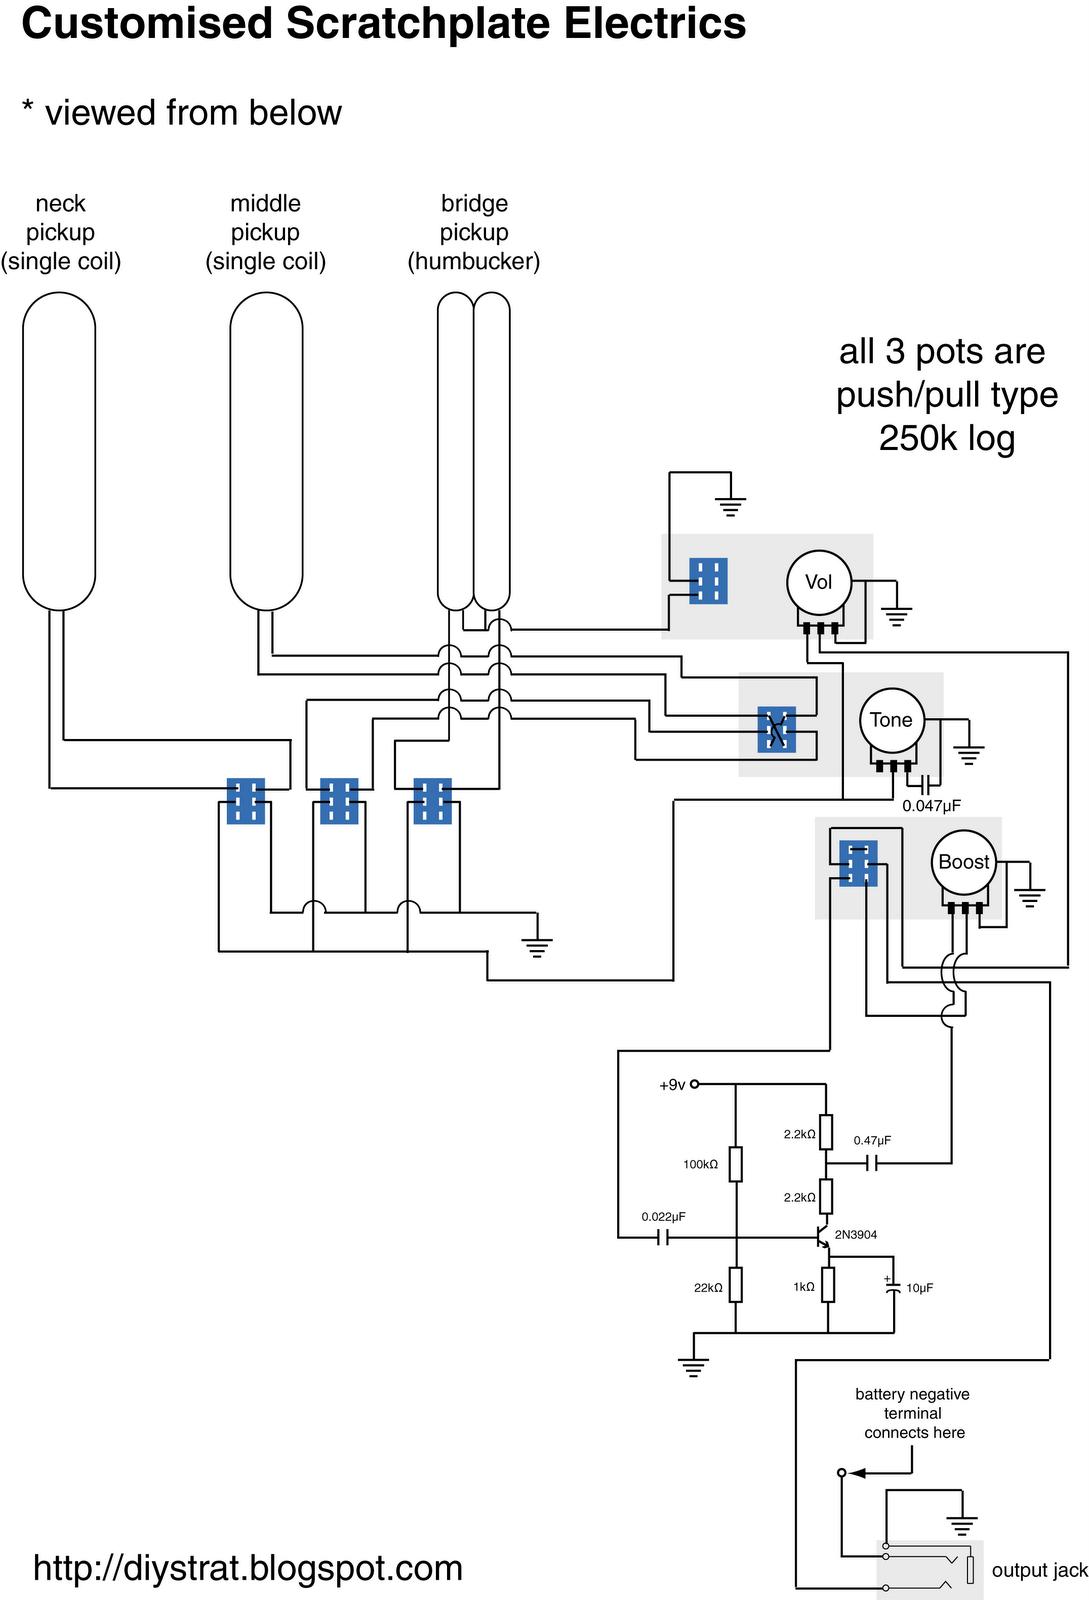 humbucker strat schematics